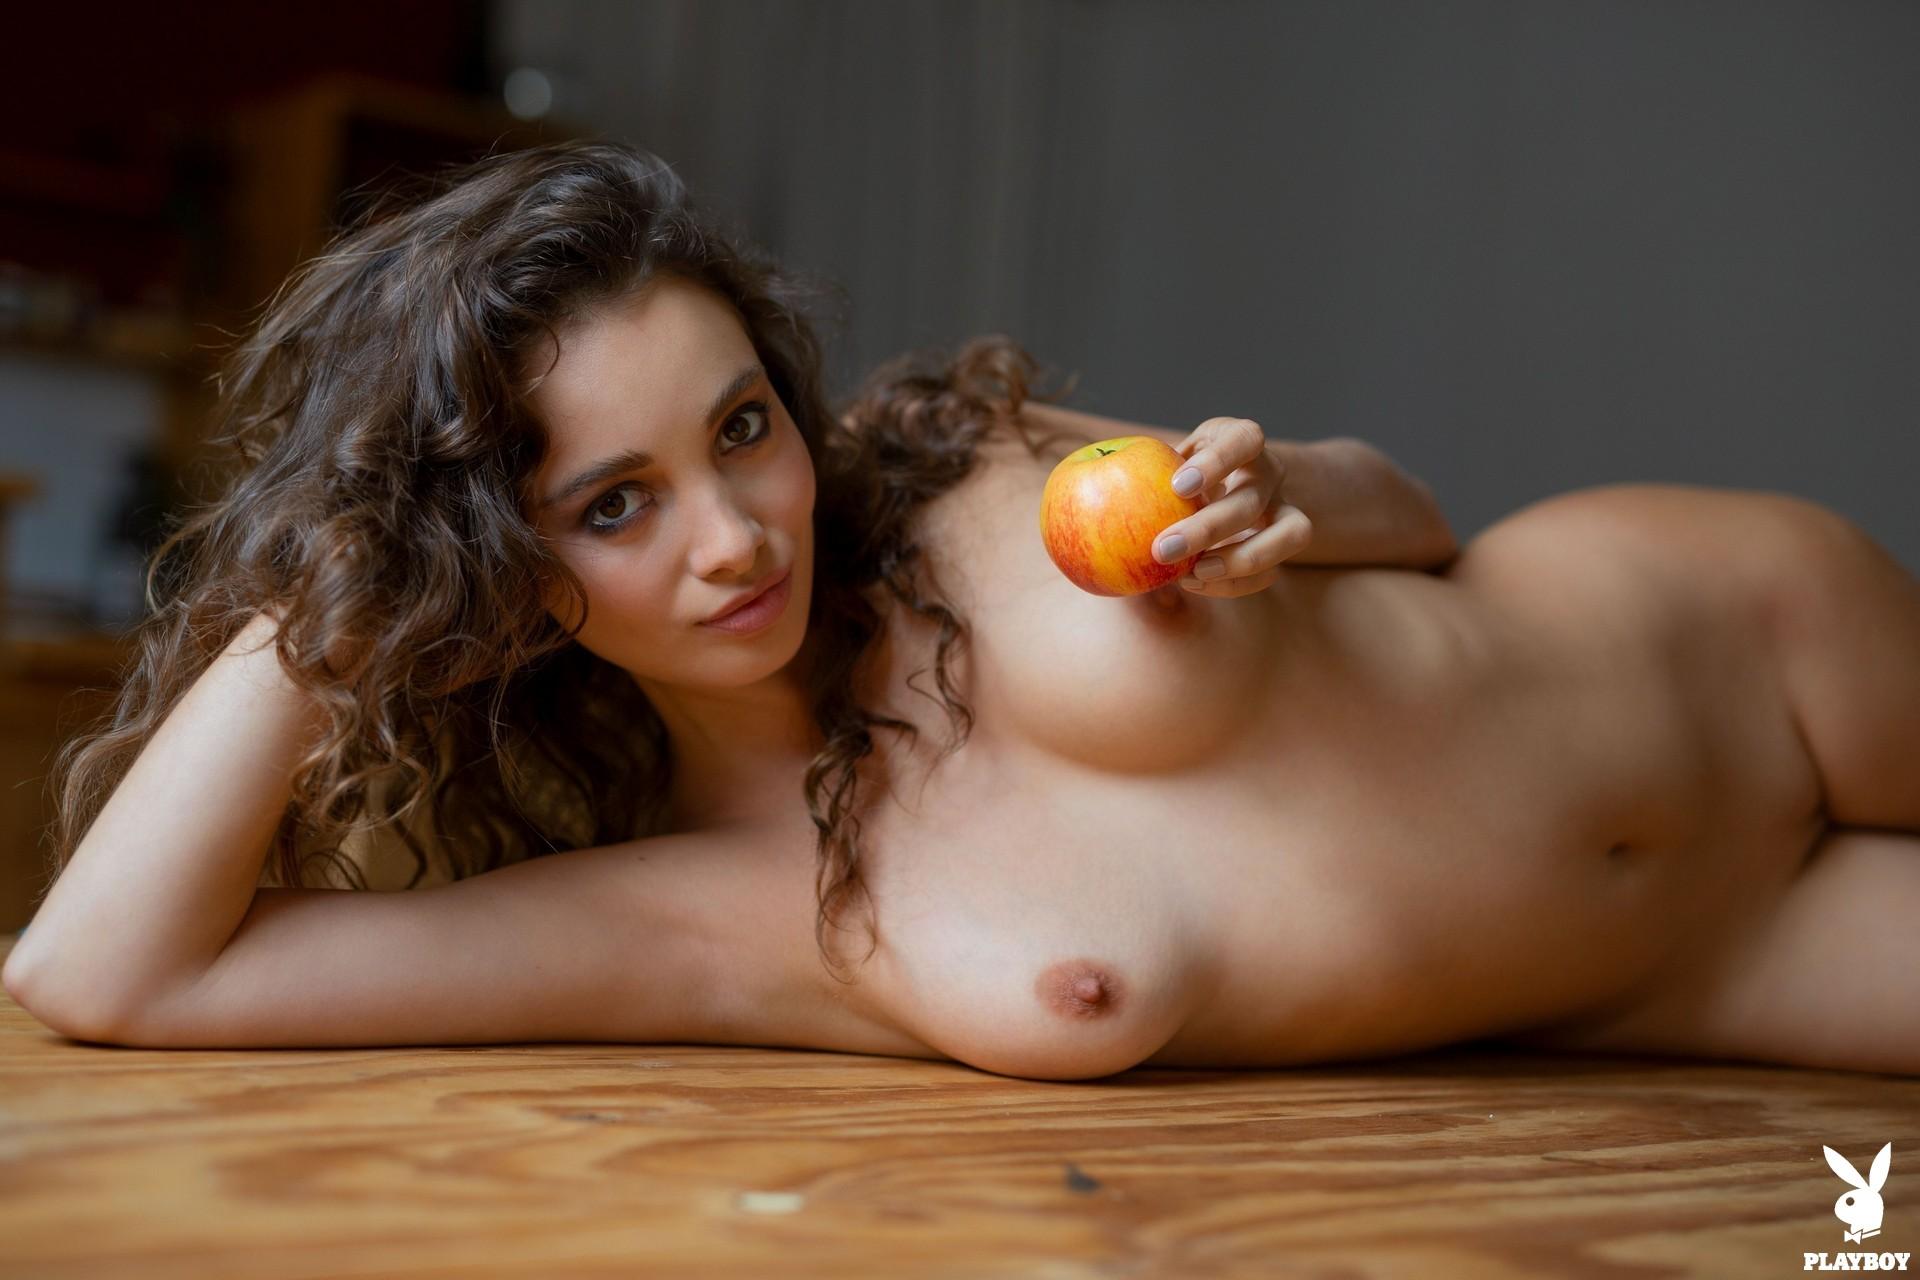 Calypso Muse in Tempting Fruit - Playboy Plus 23